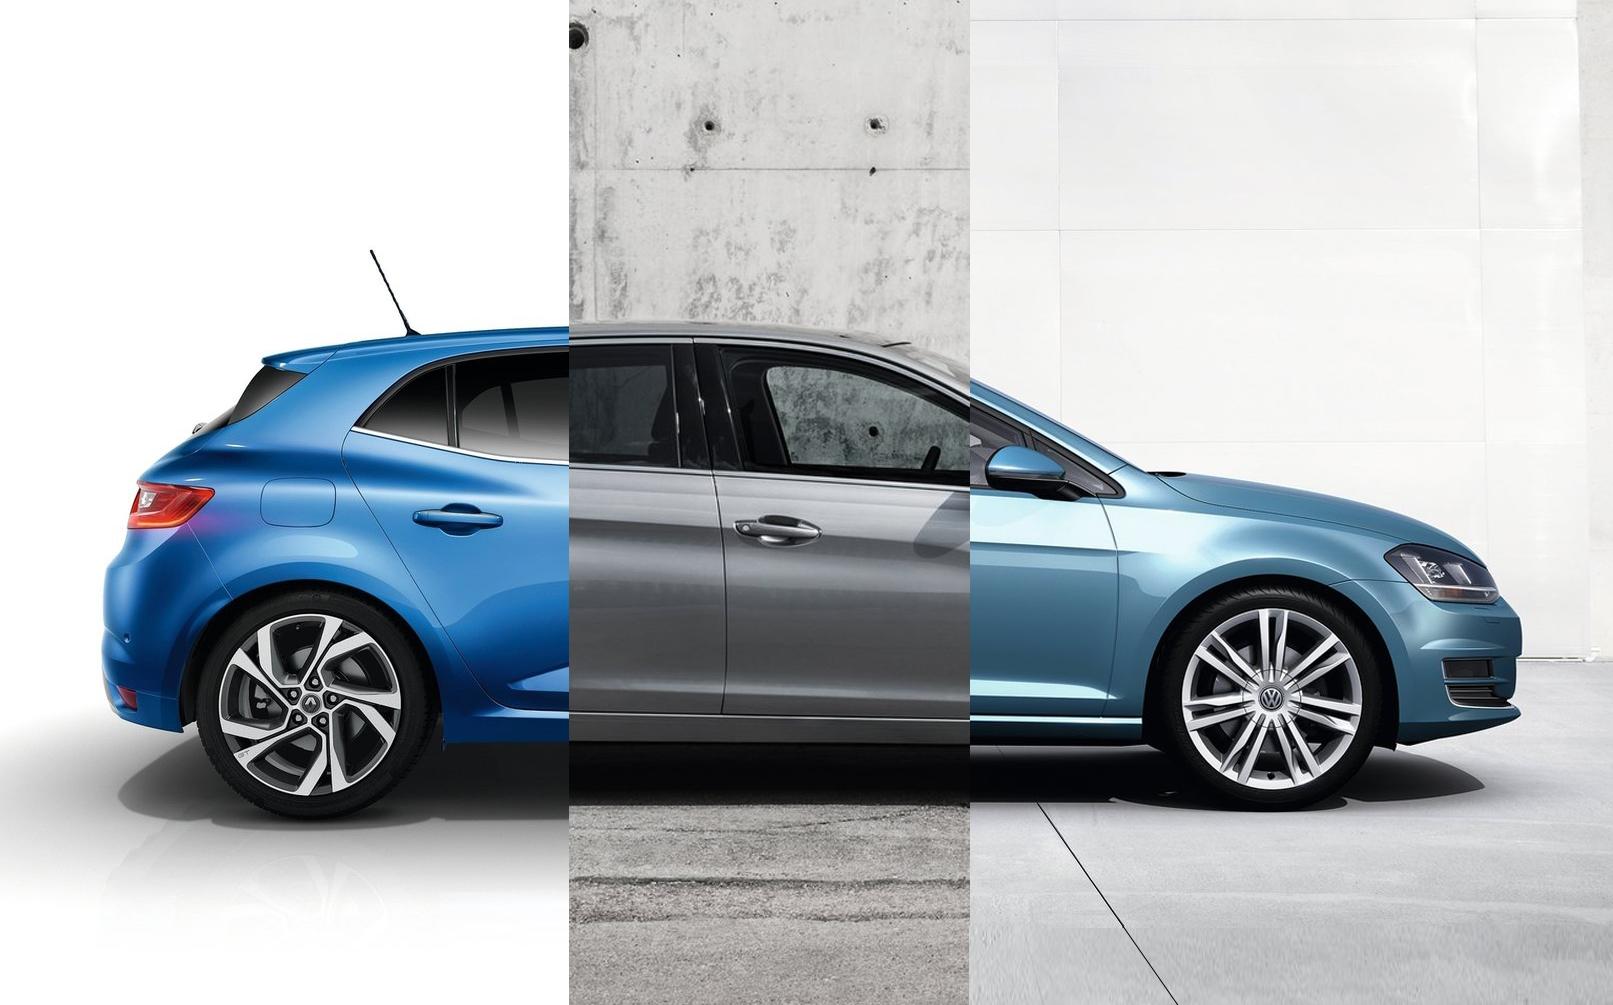 Ny familiebil: 5 skarpe leasingtilbud i mellemklassen | Bilmagasinet.dk